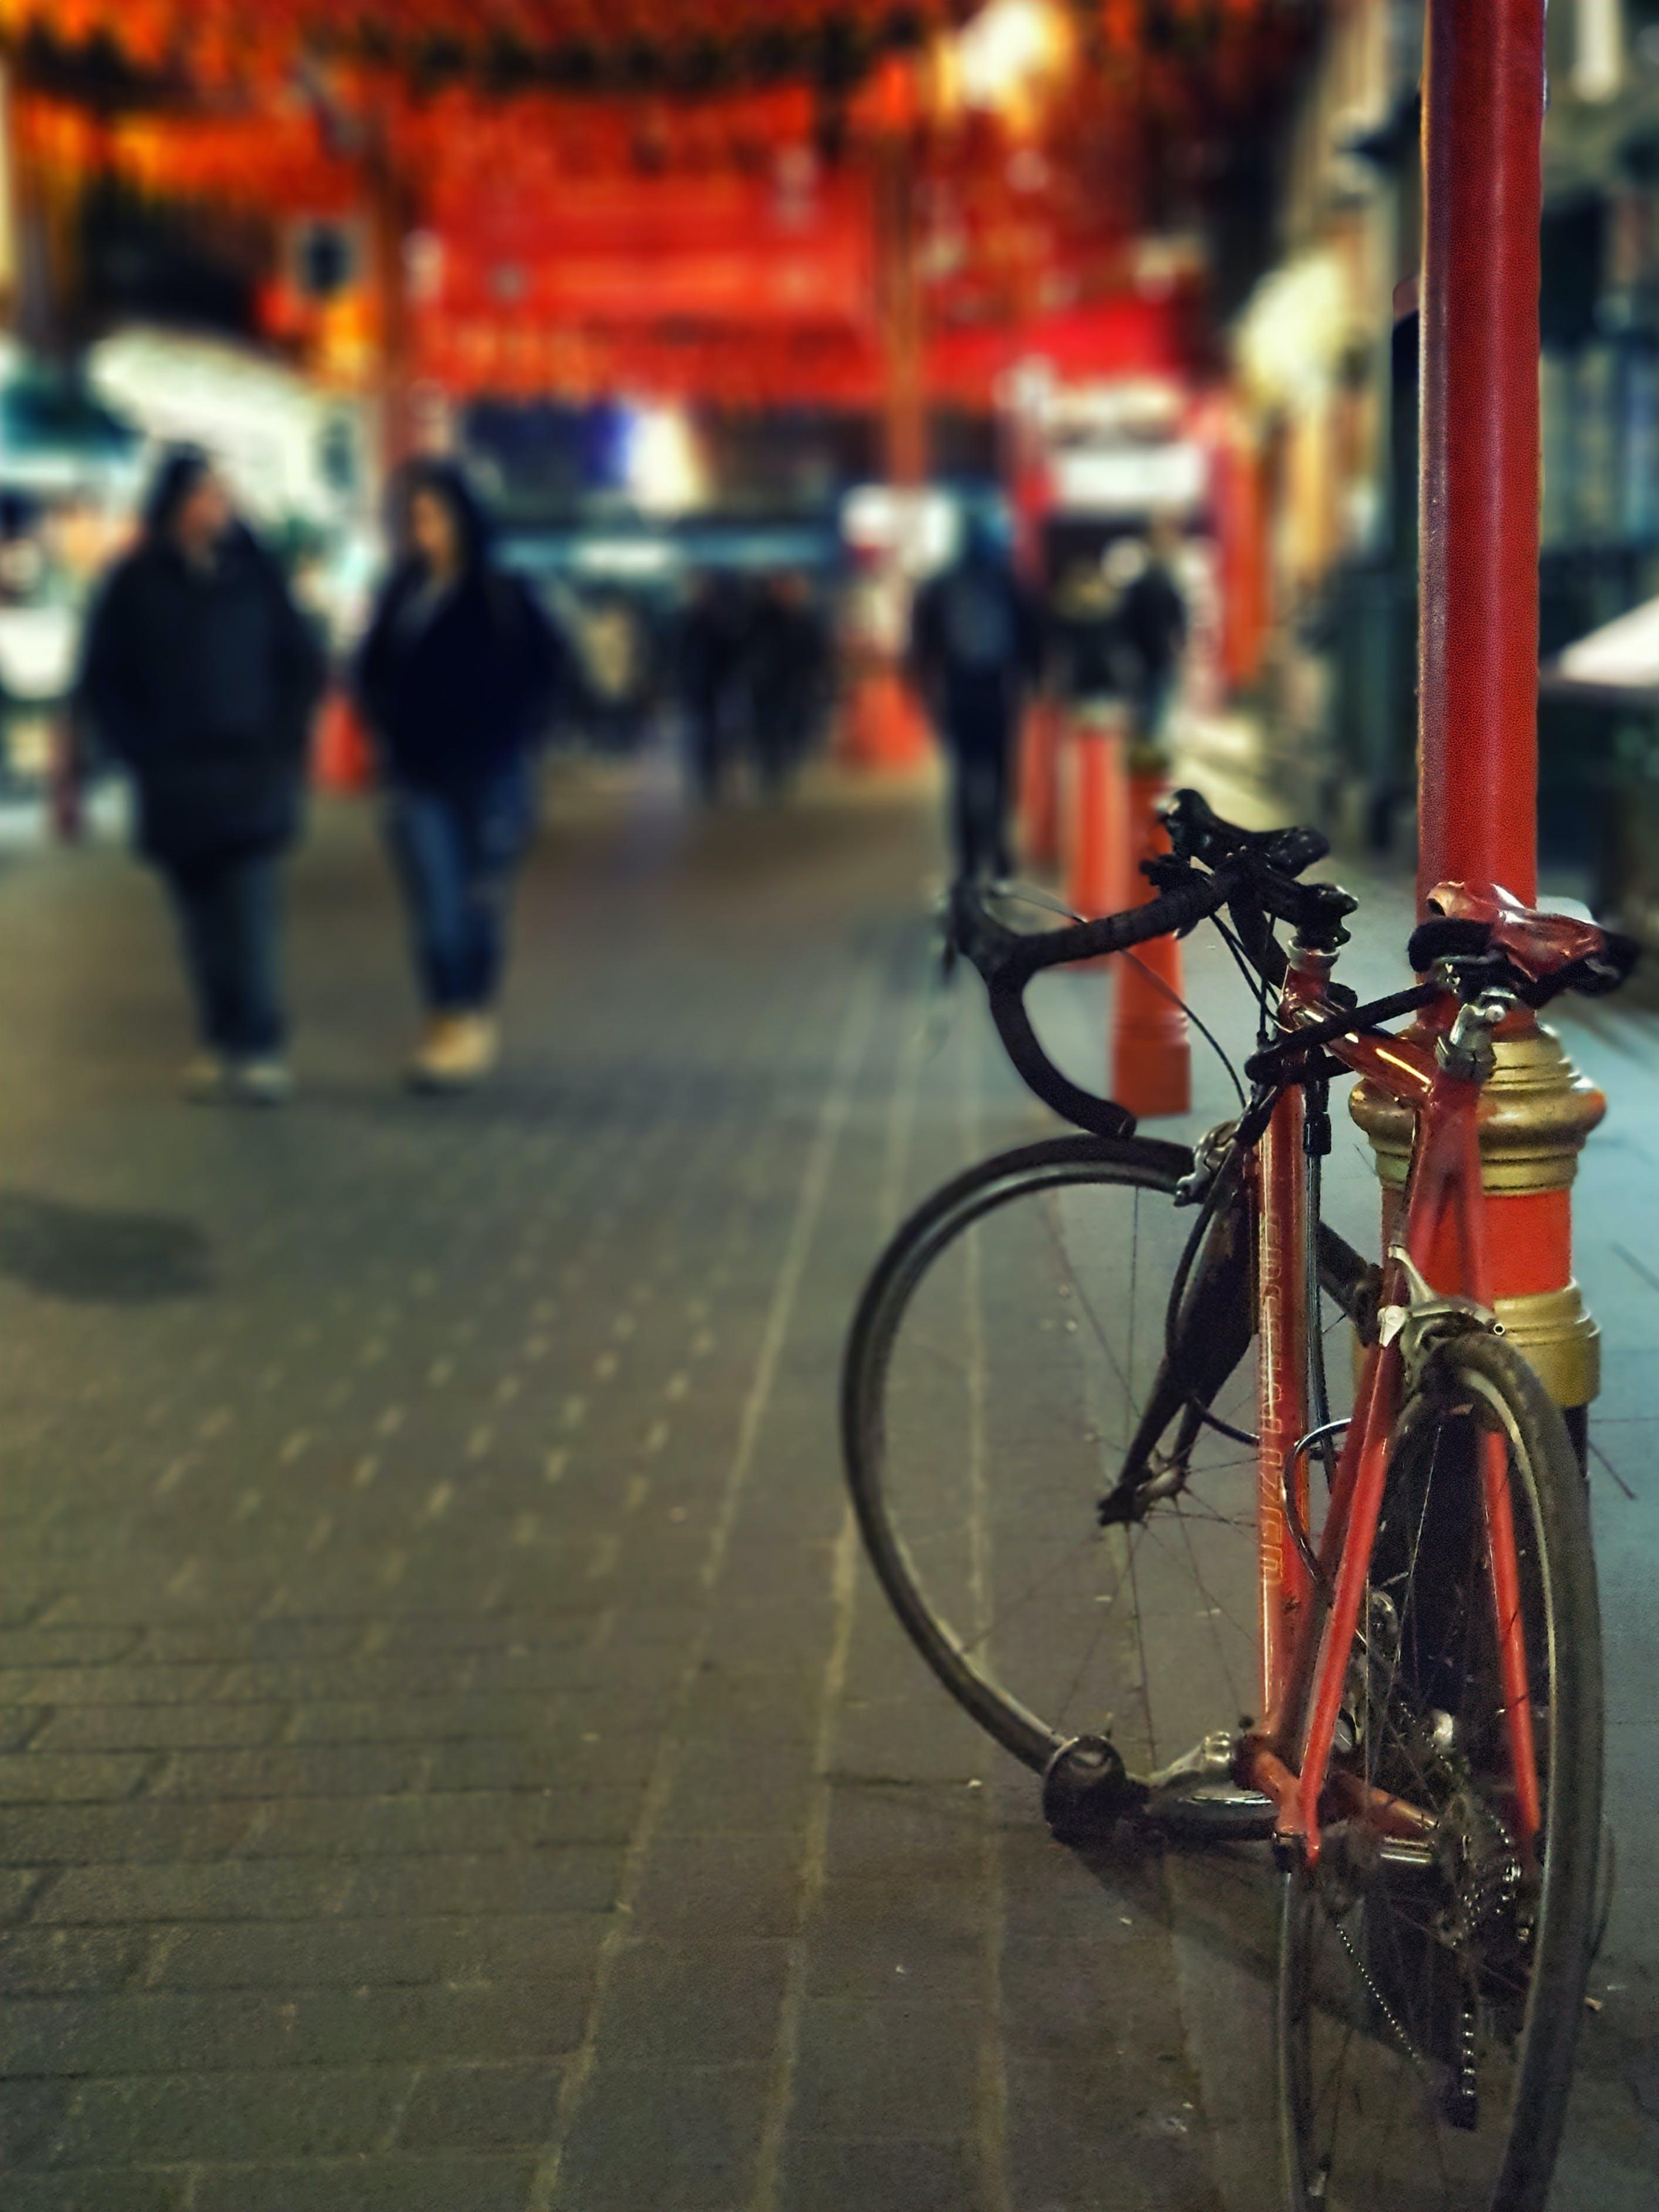 Kostenloses Stock Foto zu bürgersteig, fahrrad, transportsystem